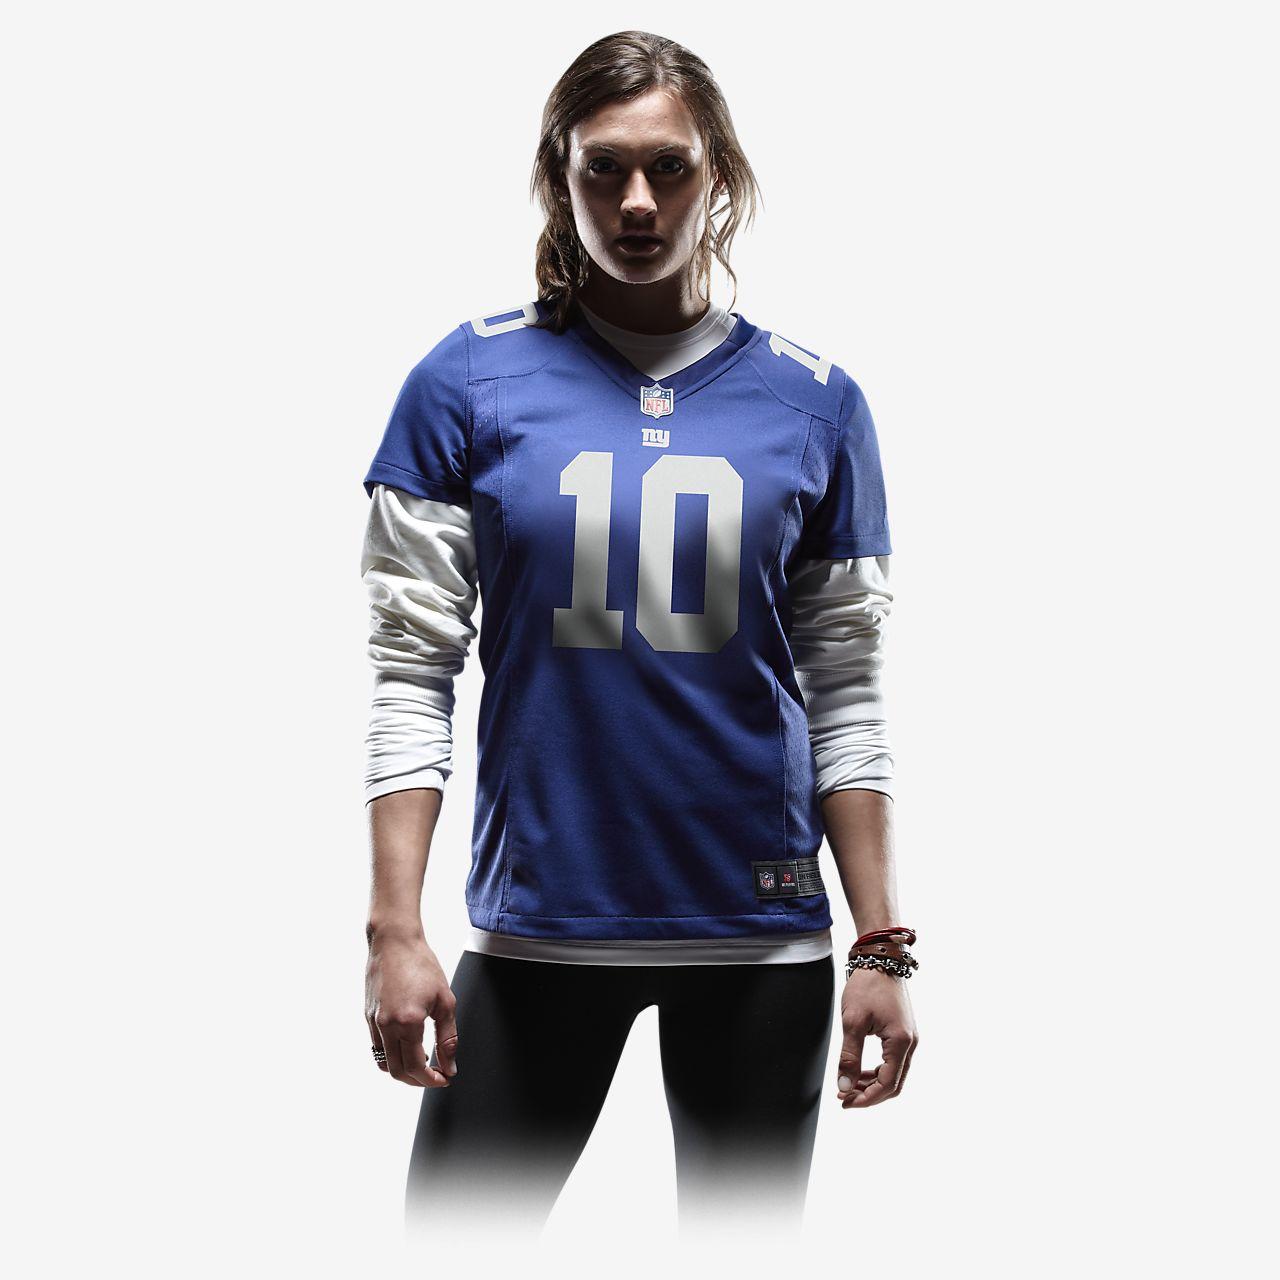 ae279265 NFL New York Giants Game (Eli Manning) Women's American Football Jersey